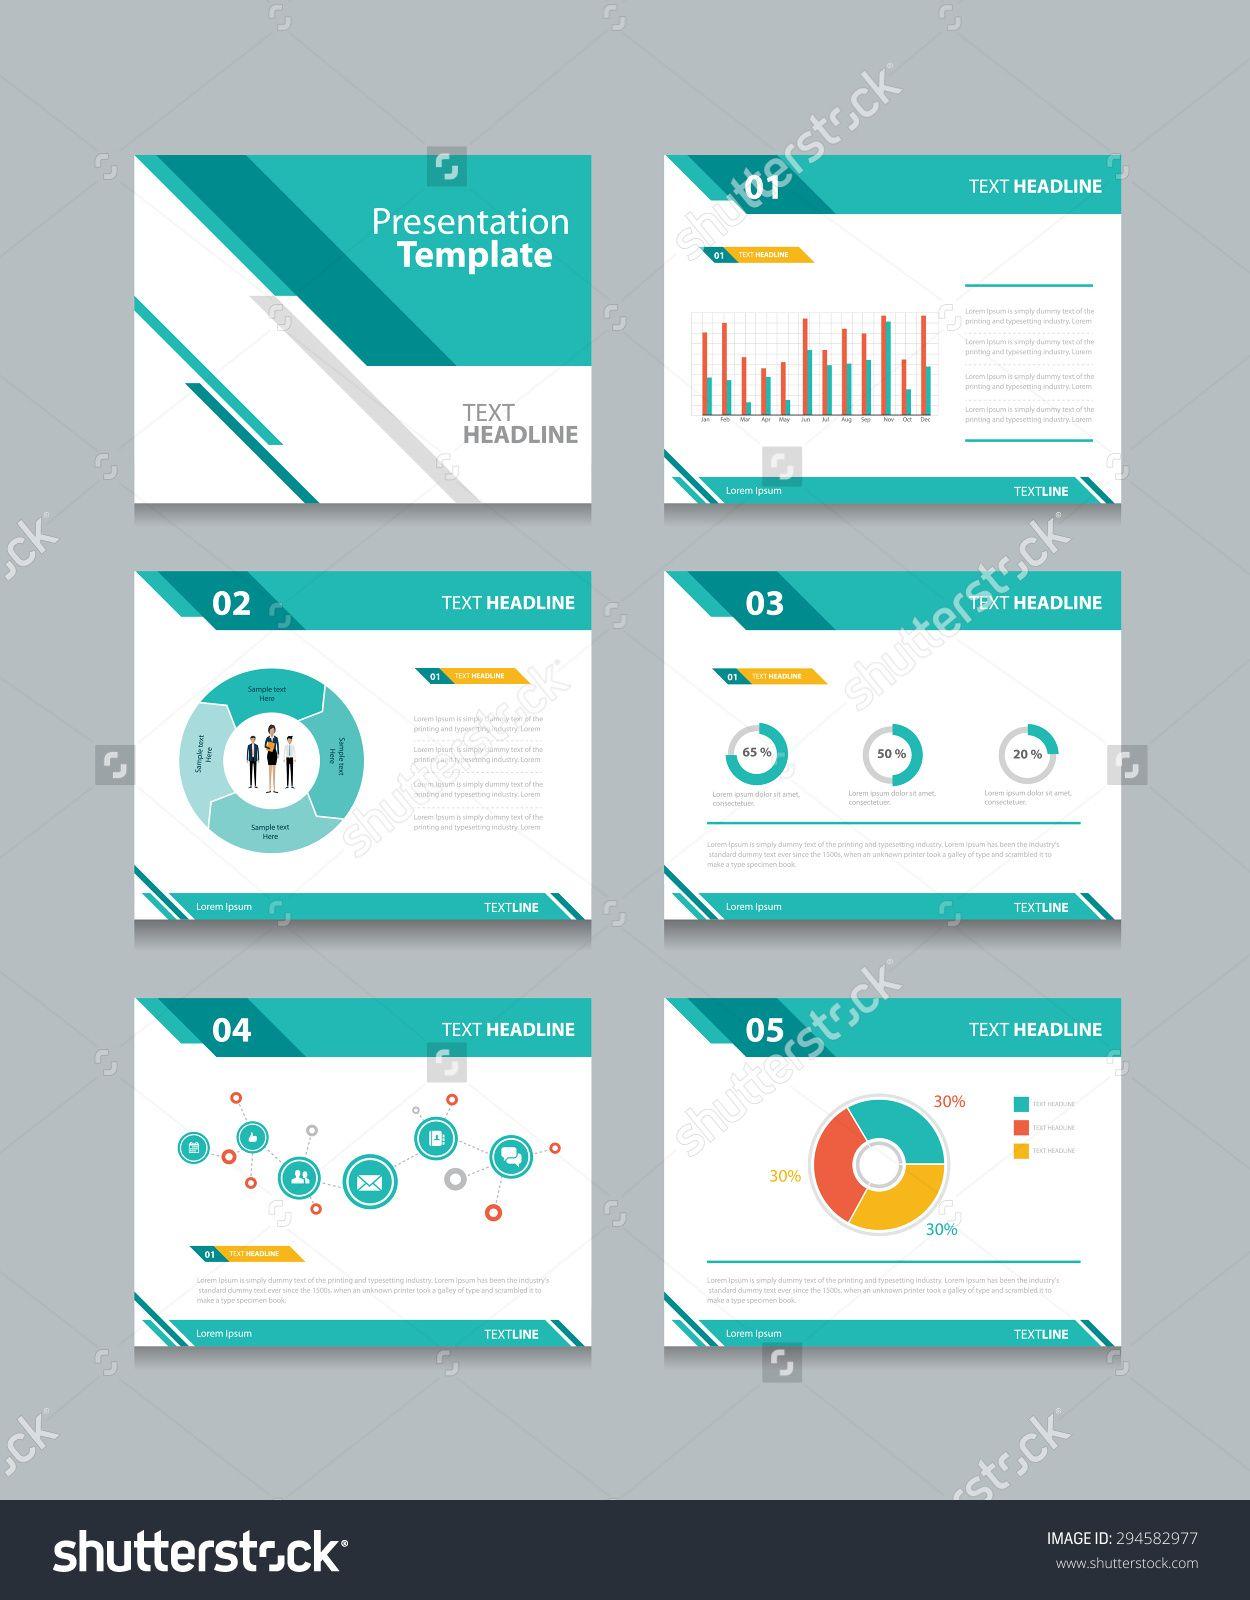 Business Presentation Template Ideas